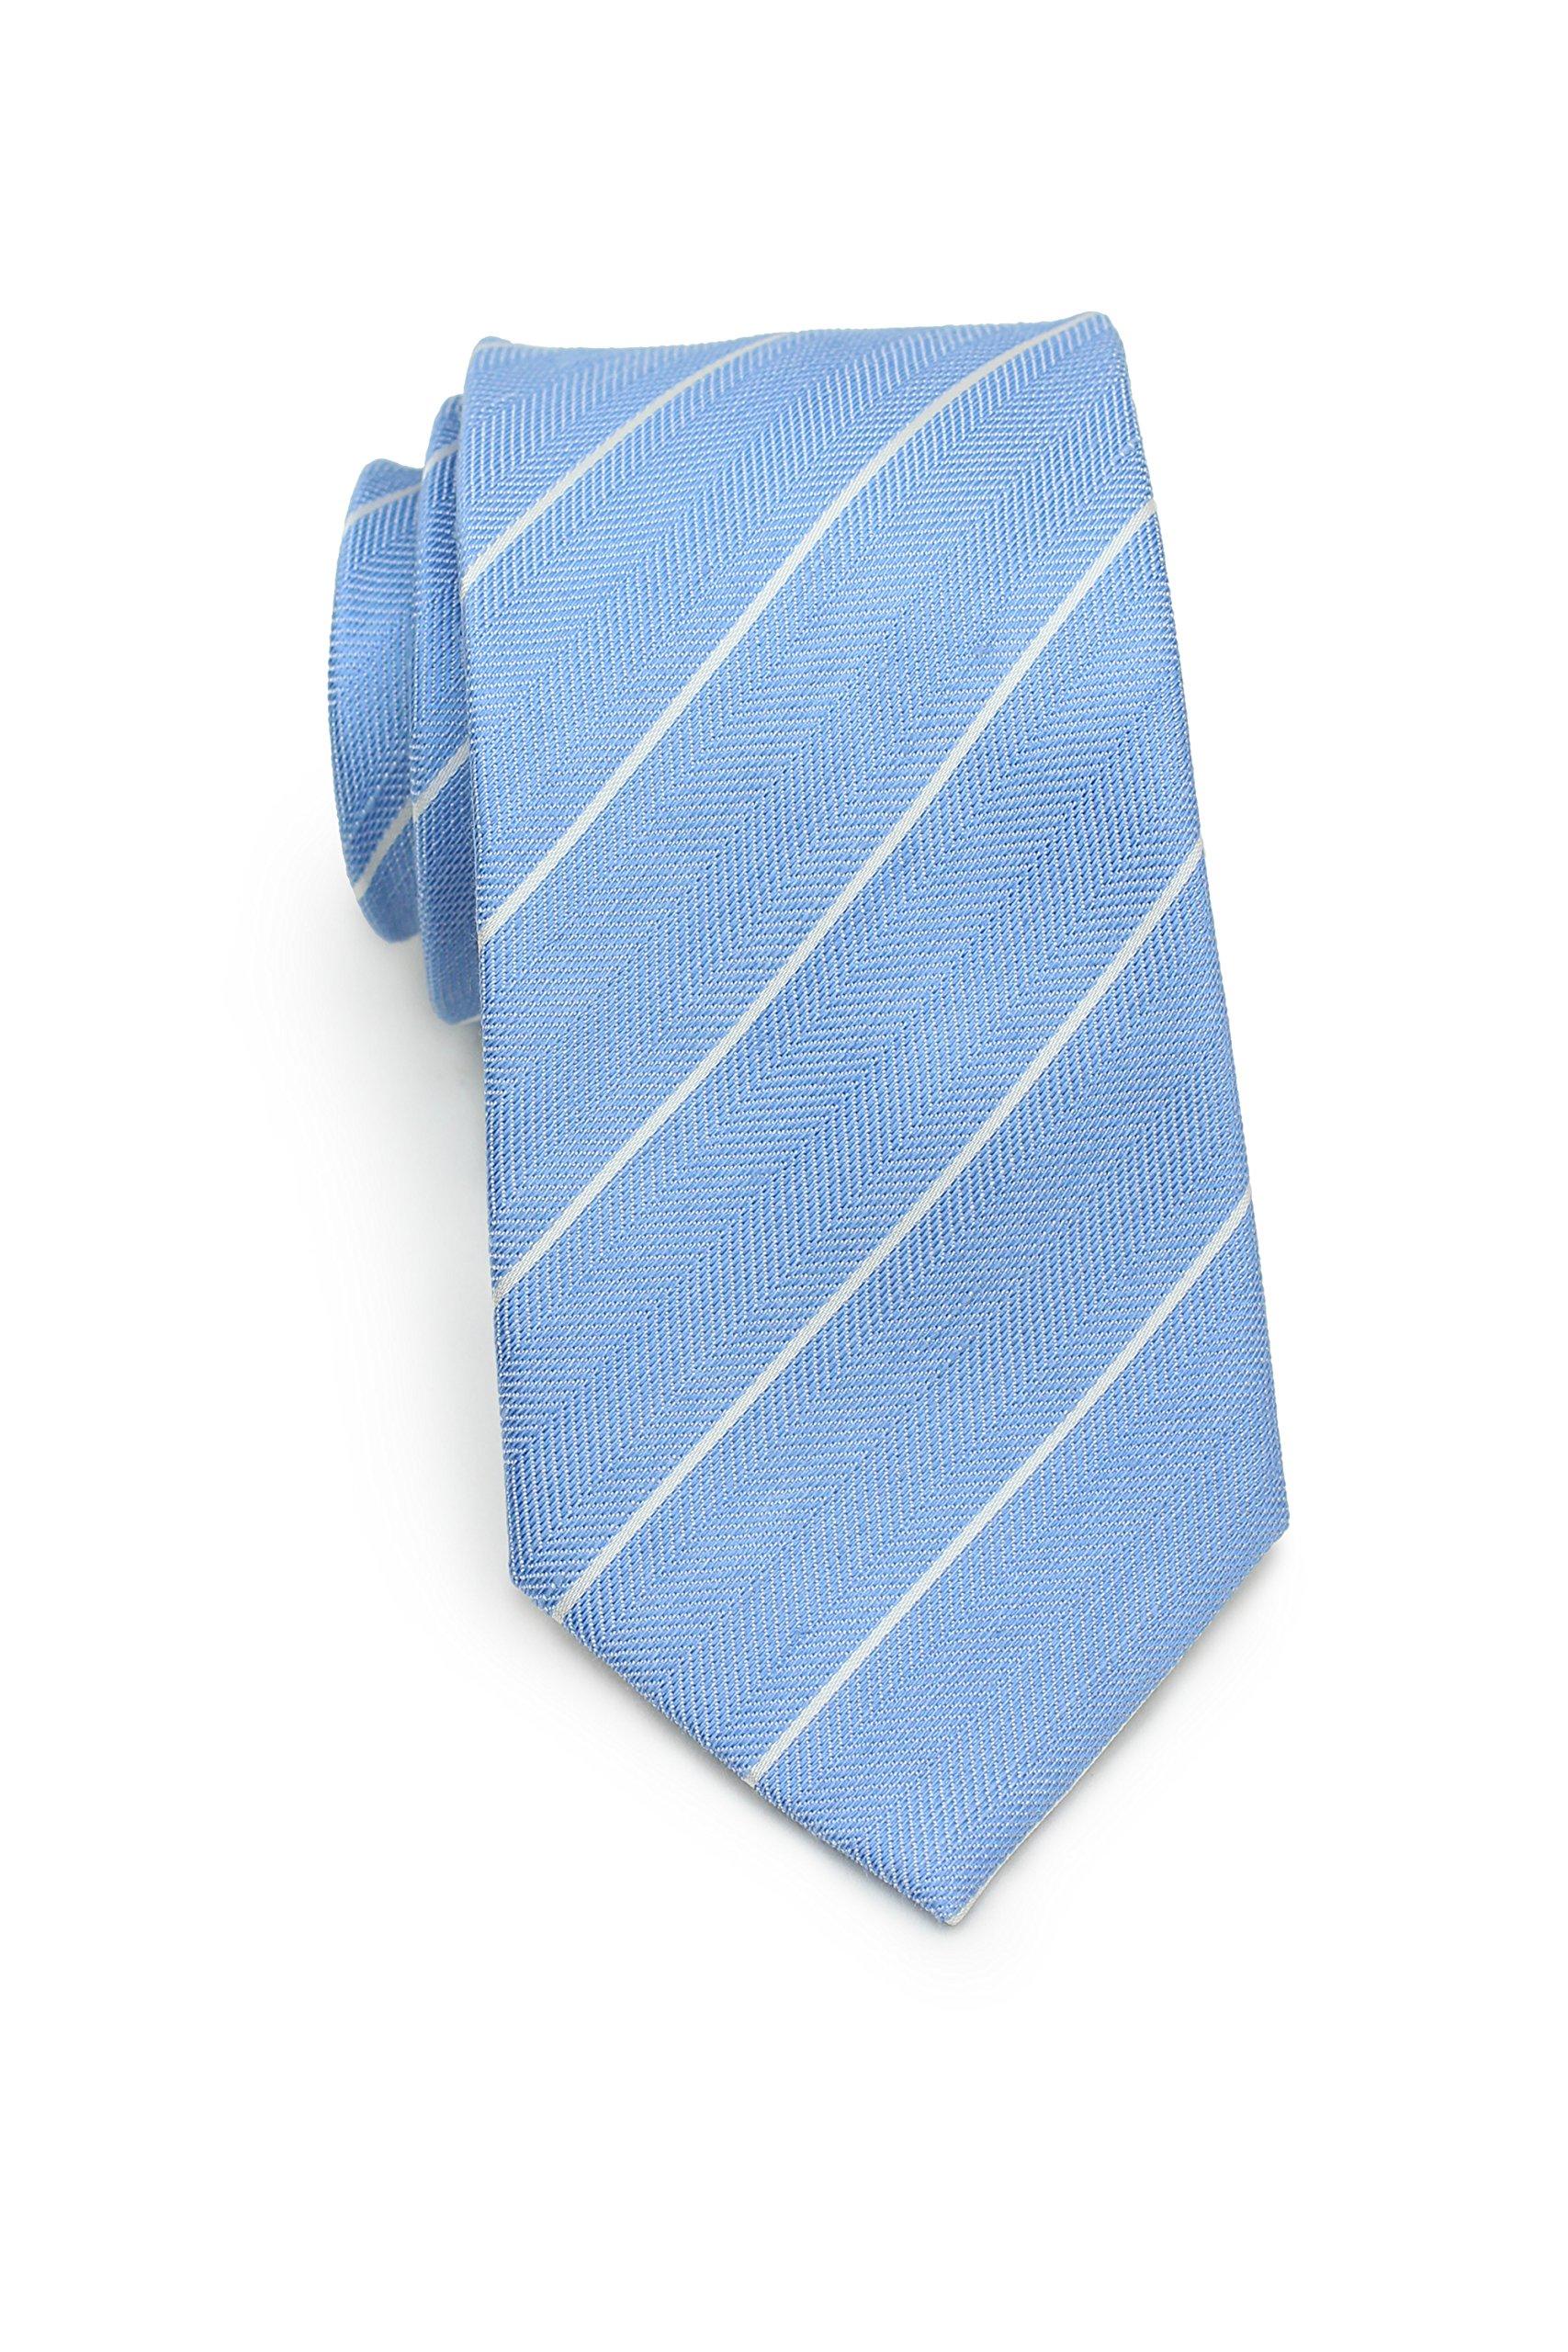 Bows-N-Ties Men's Necktie Summer Pastels Linen Skinny Matte Tie 2.75 Inches (Powder Blue Stripes)